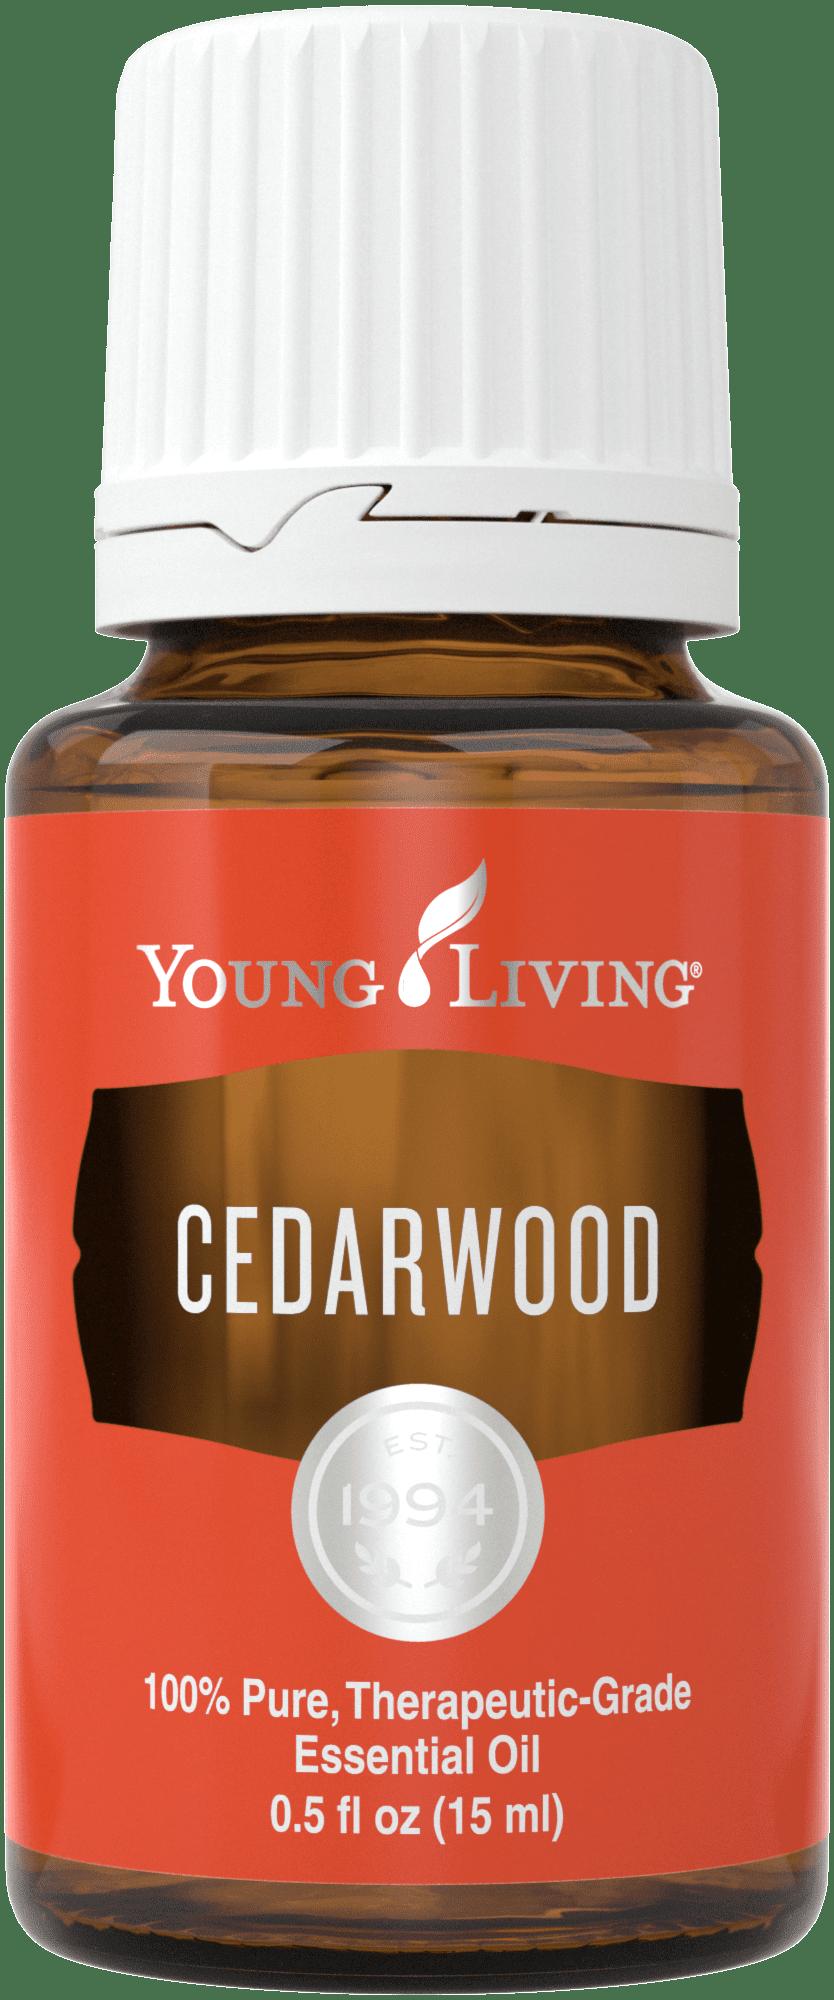 Ätherisches Öl Young Living: Cedarwood (Zedernholz) 15ml